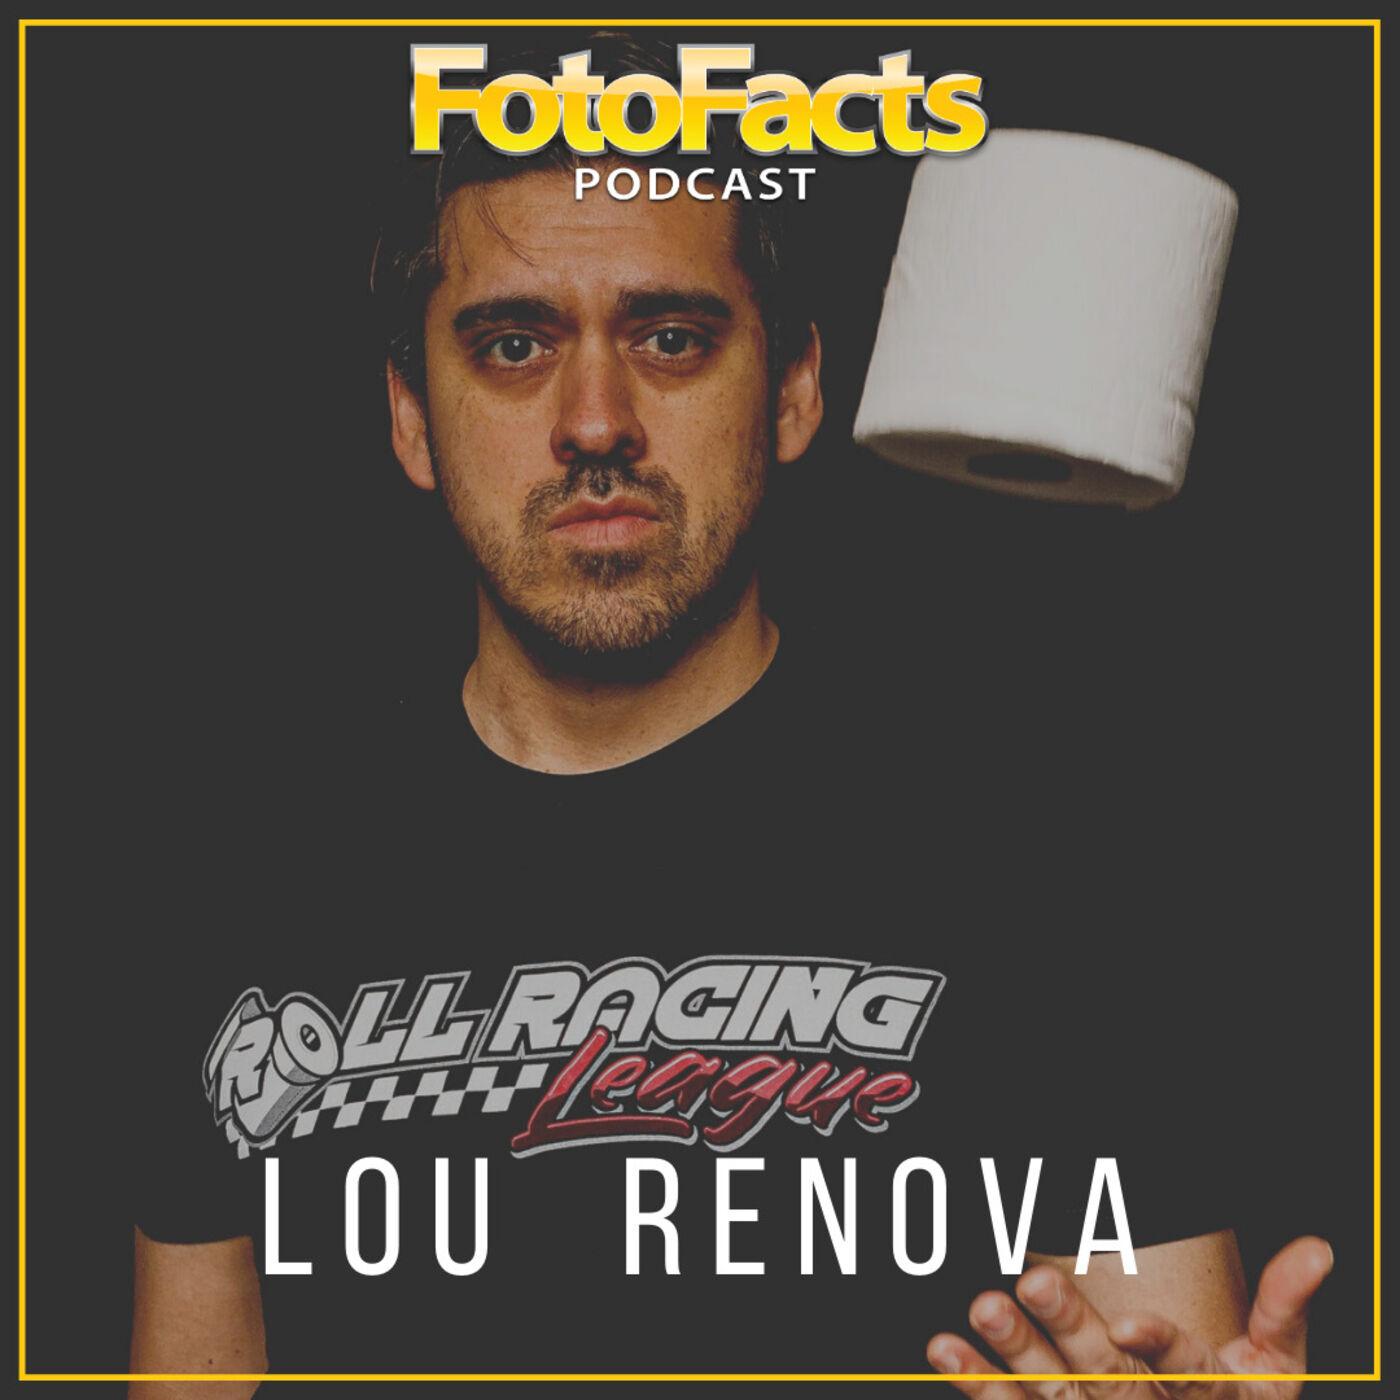 Famous by Proxy with Lou Renova